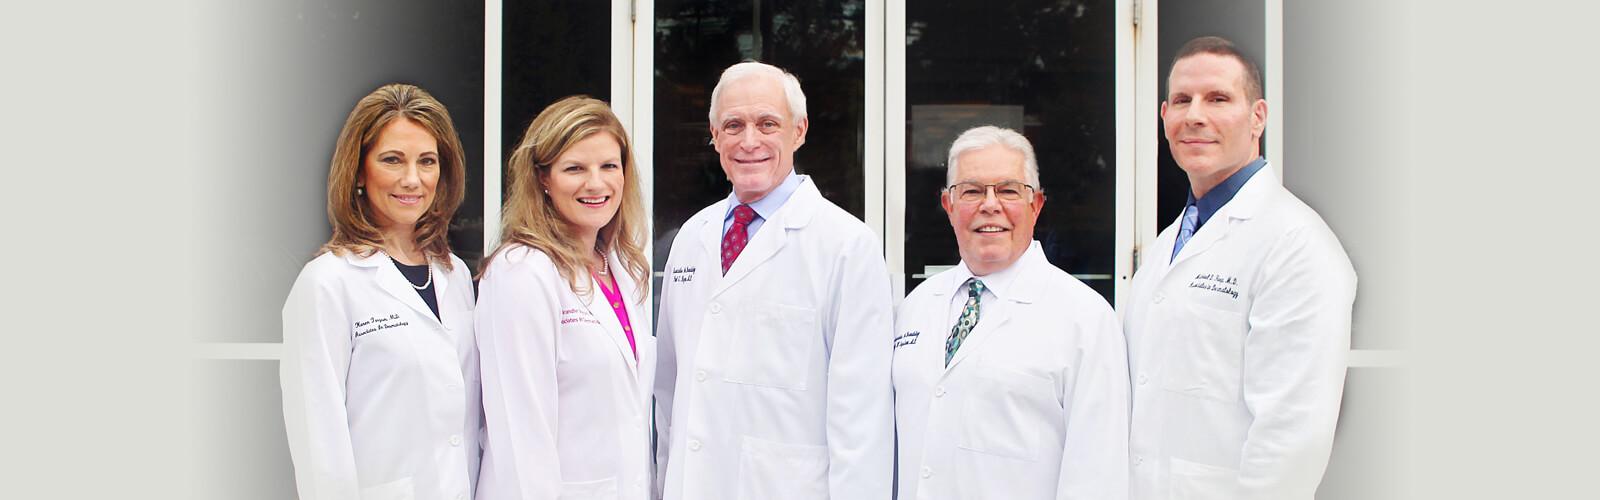 Team Image - Associates In Dermatology